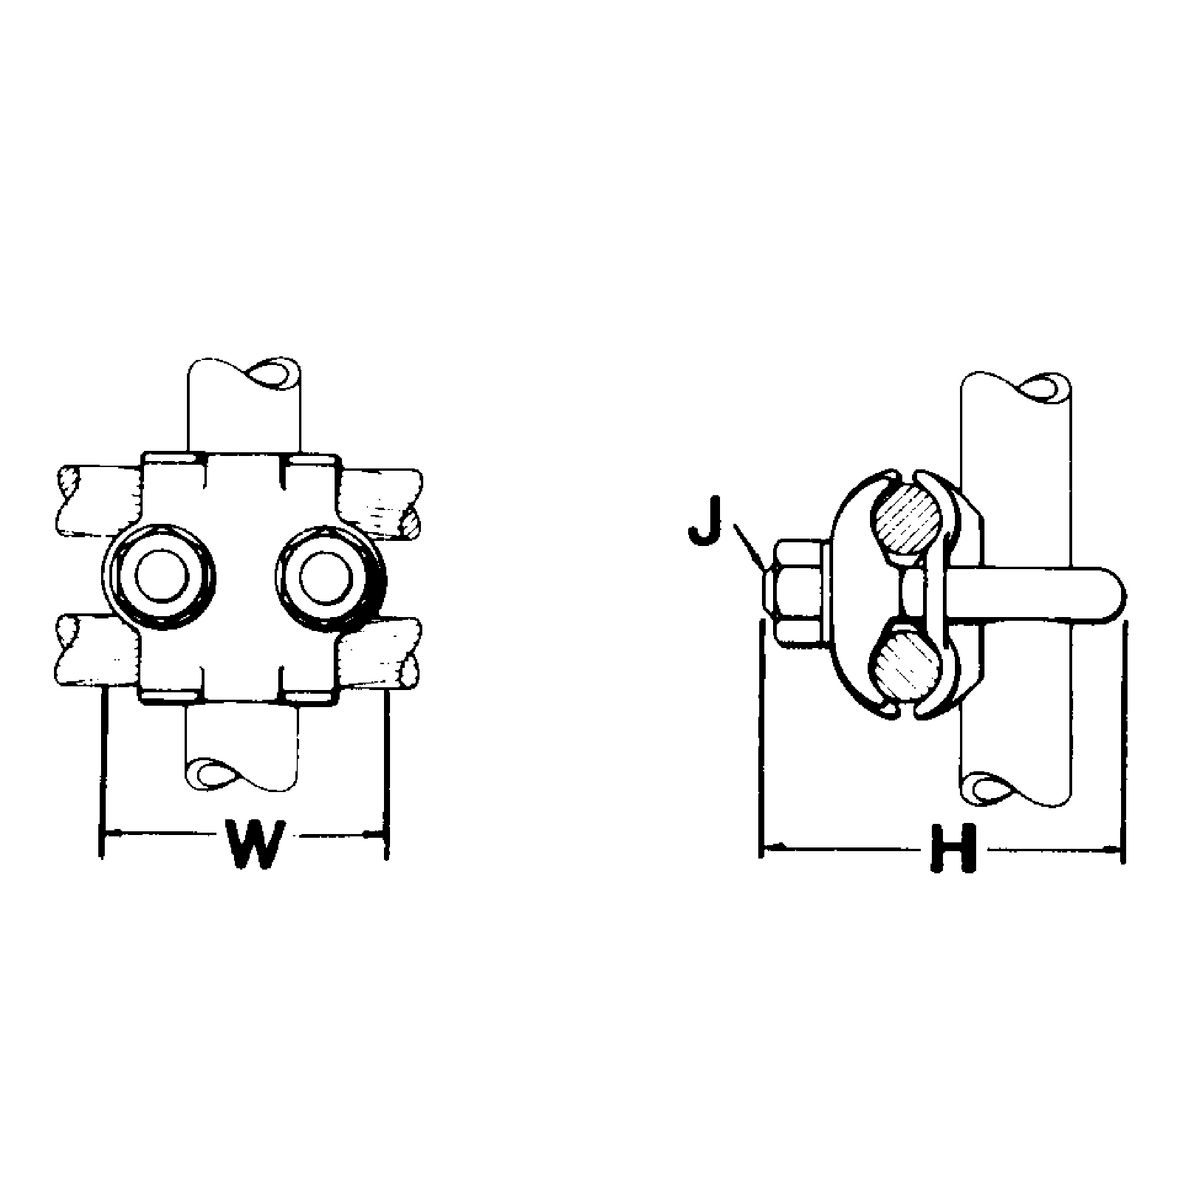 nec wiring solar, nec gfci breaker diagram, nec wiring codes, nec wiring symbols, nec breaker box wiring, solar electrical connections diagrams, on nec wiring diagram symbols